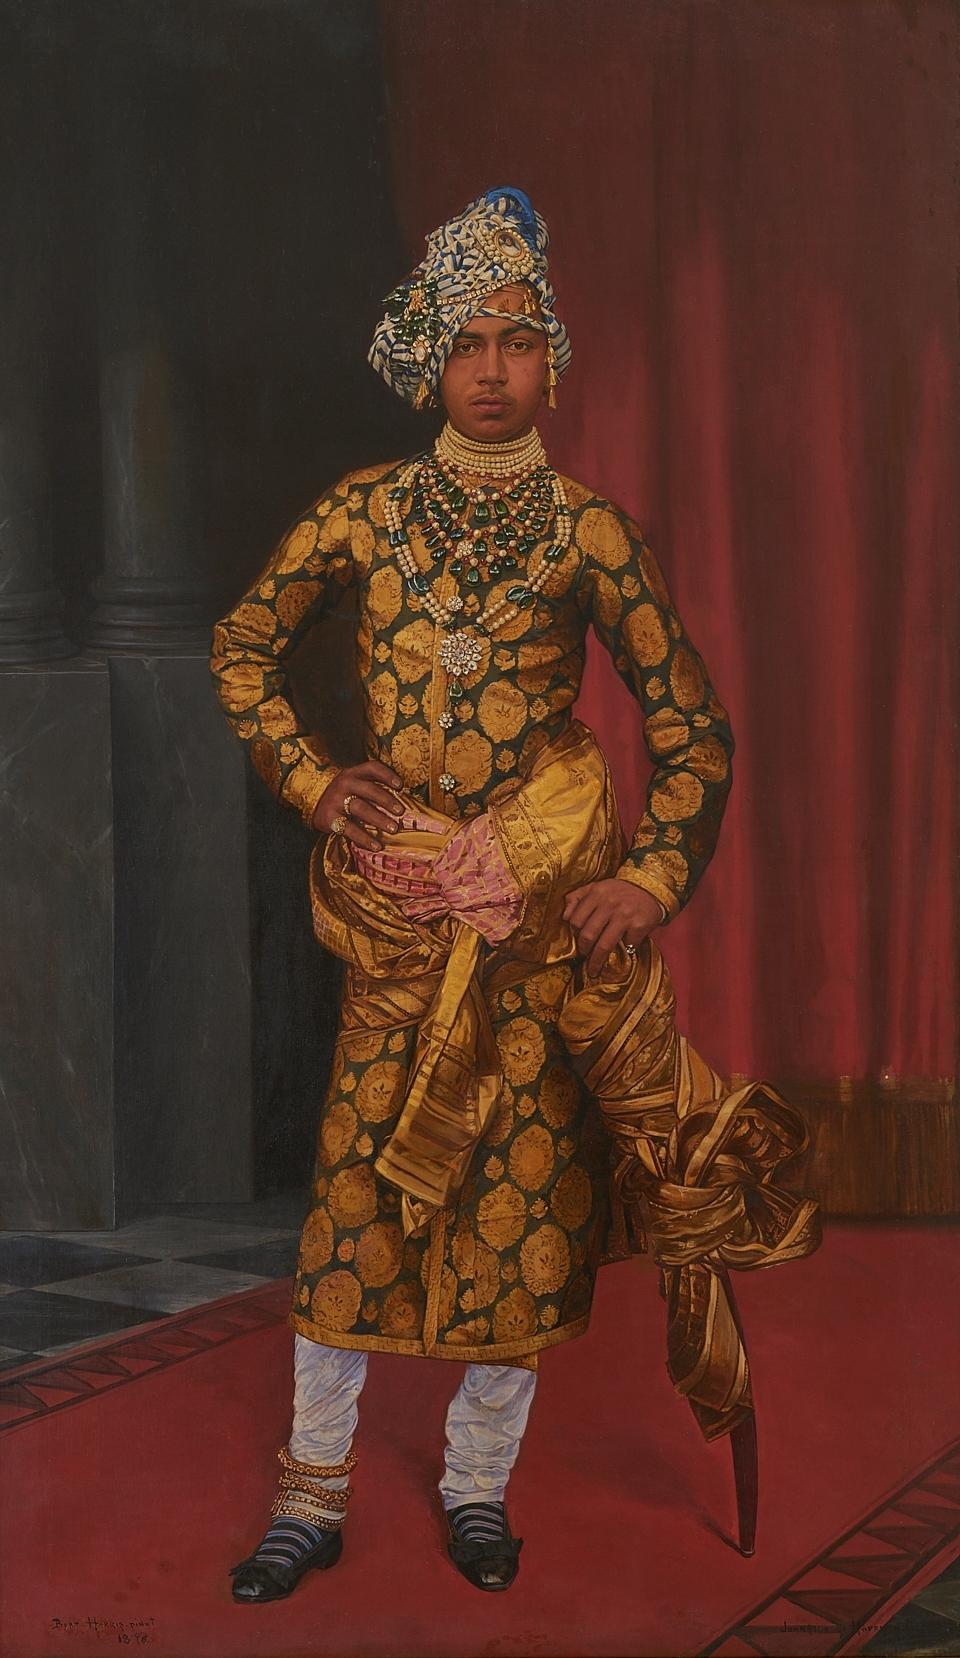 Portrait of Maharaja Sardar Singh, by Bert Harris (1896, oil on canvas) (Photo courtesy: Mehrangarh Fort Museum via Laura Marsolek, published with permission)